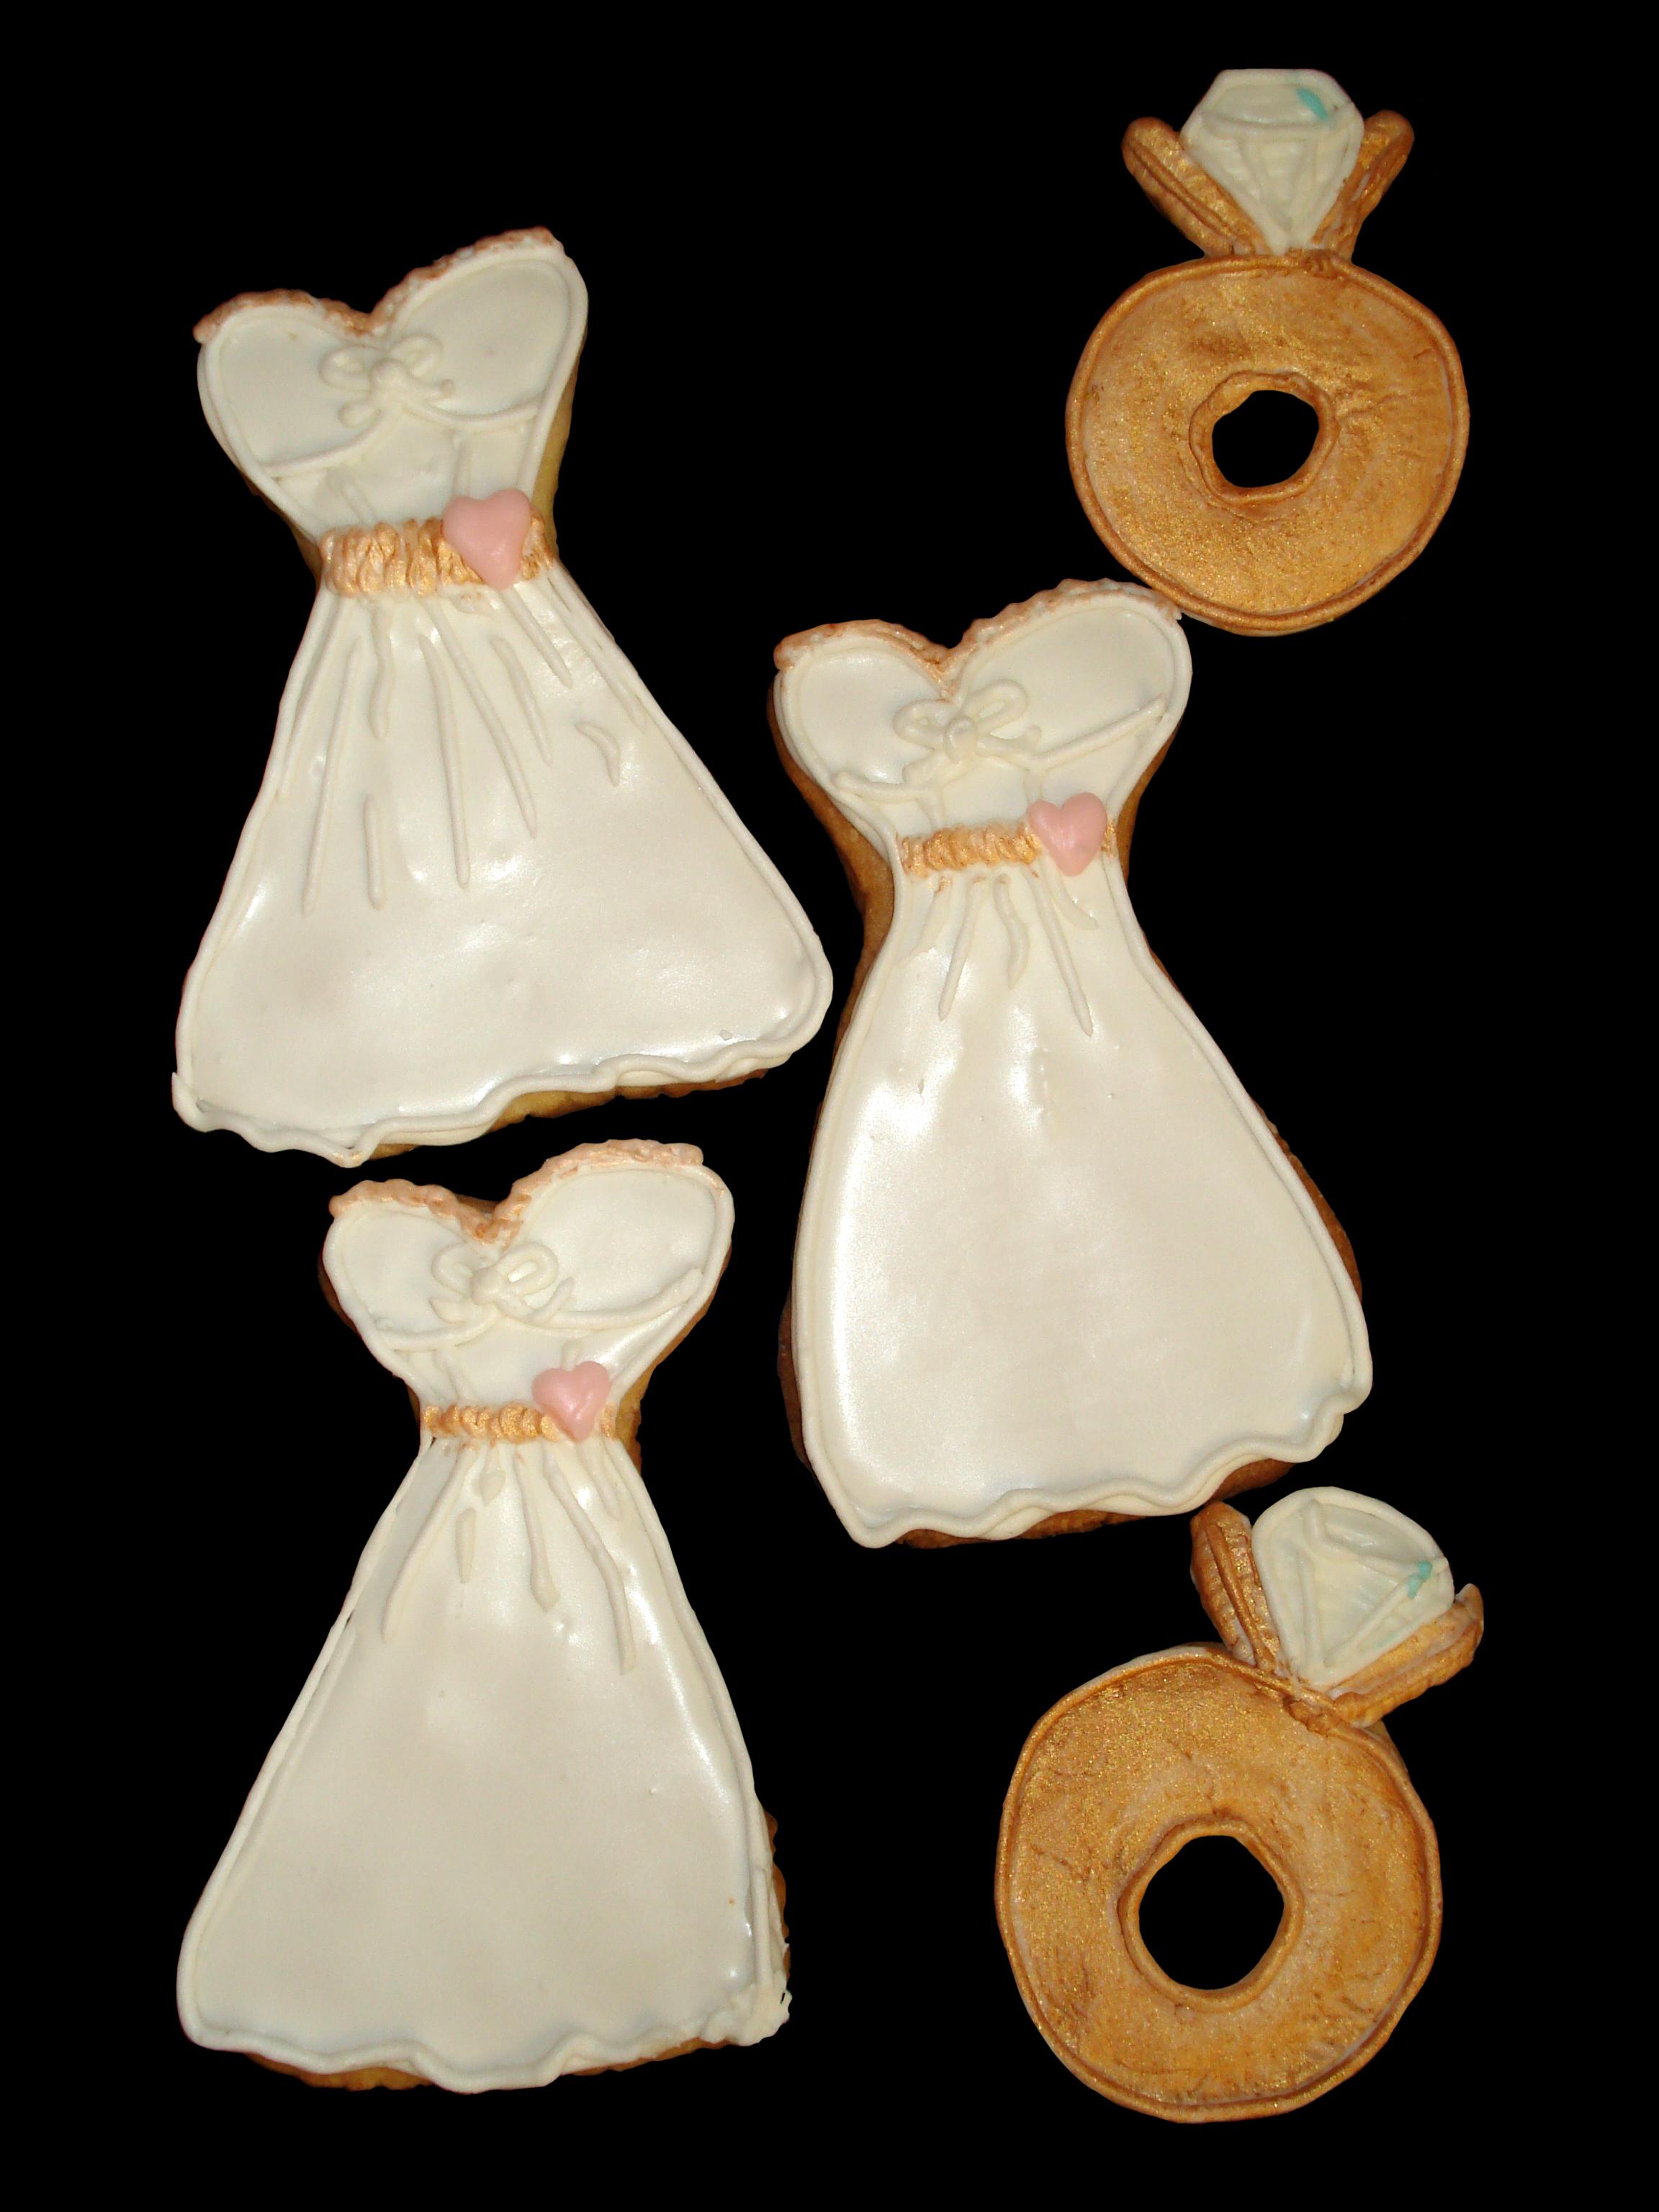 Cookie Wedding Ring Dress.jpg